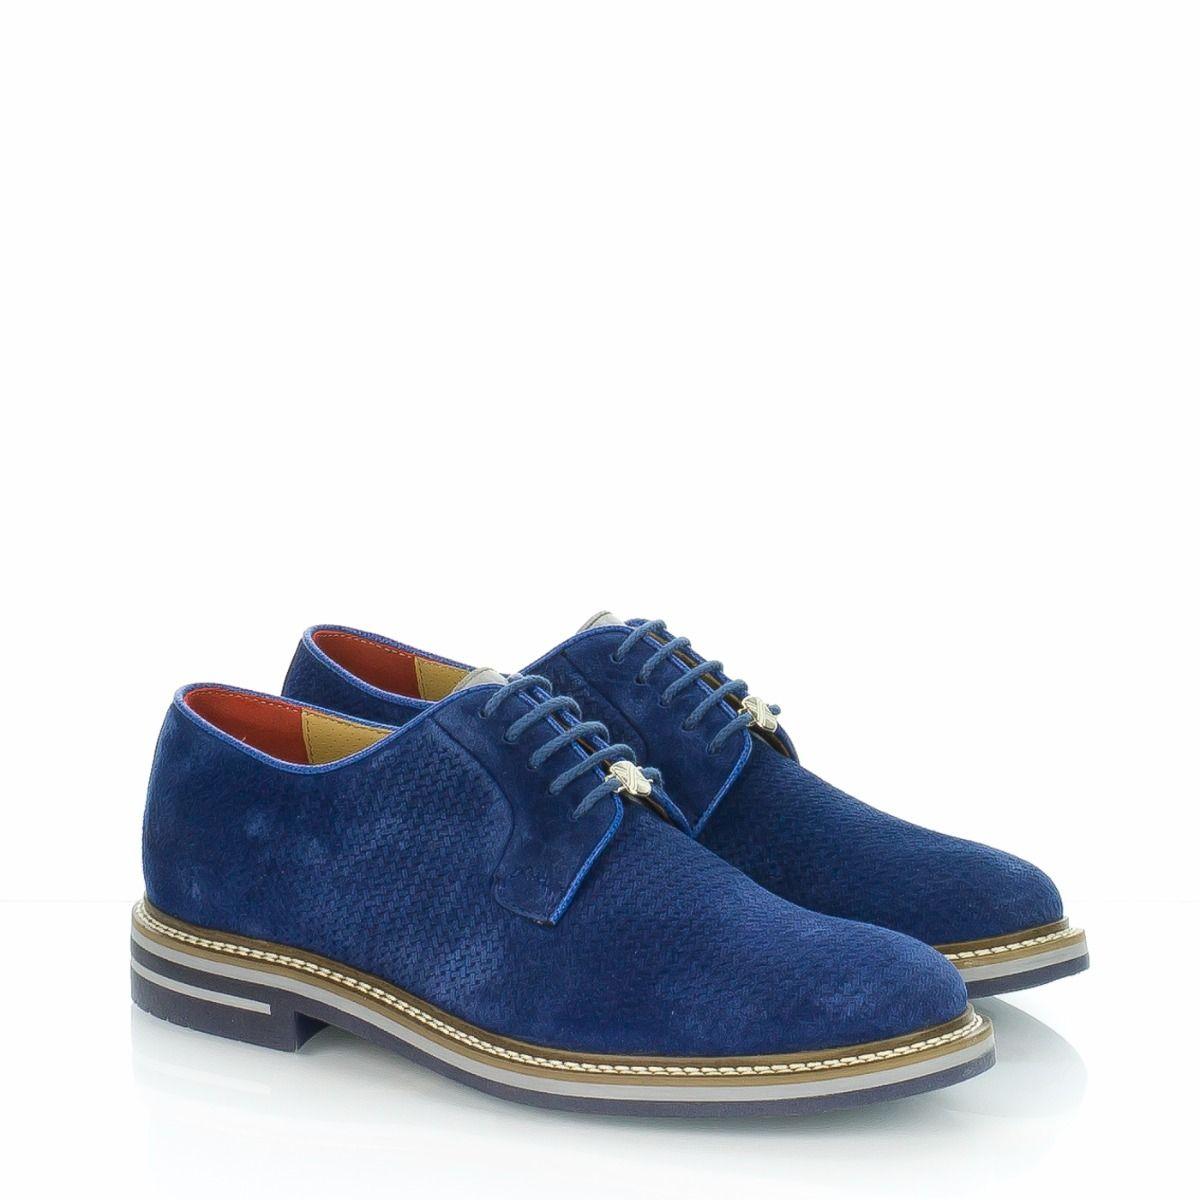 Scarpe stringate blu da uomo